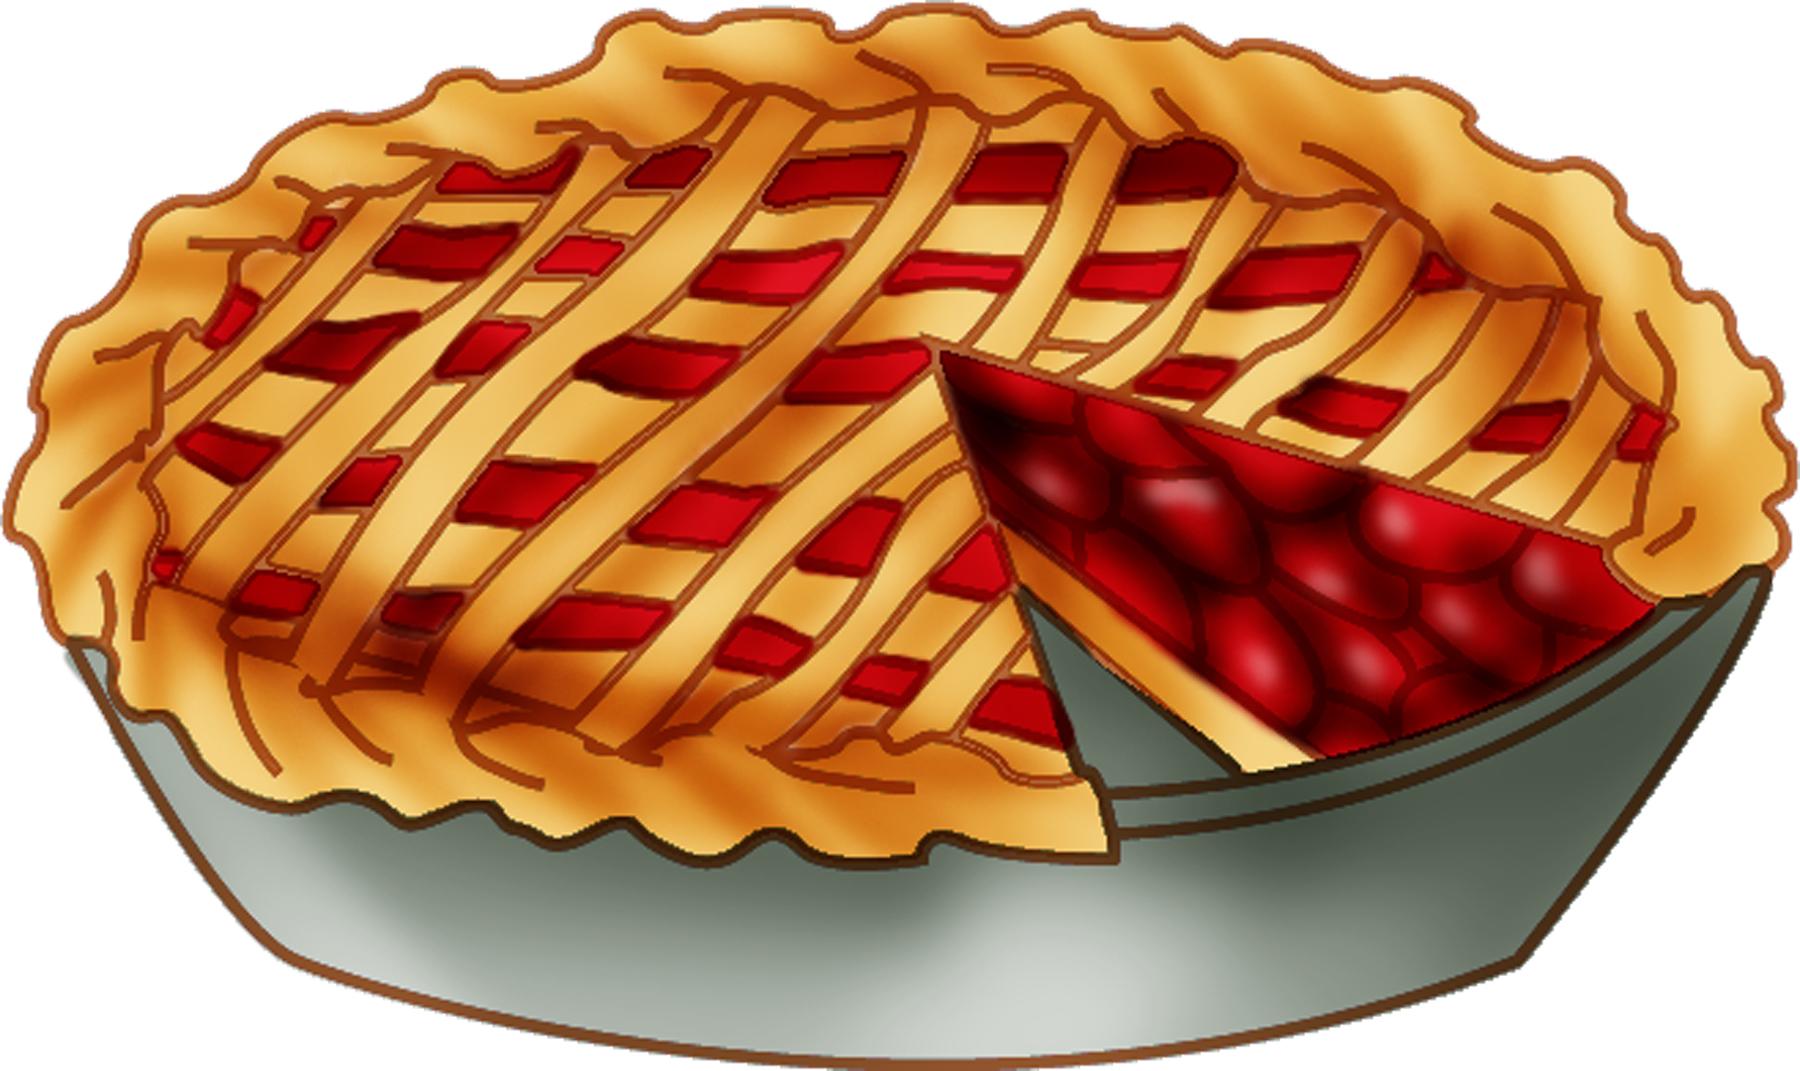 Pumpkin pie clipart jpeg svg free download Download thanksgiving clip art free clipart of pumpkin pie 2 ... svg free download